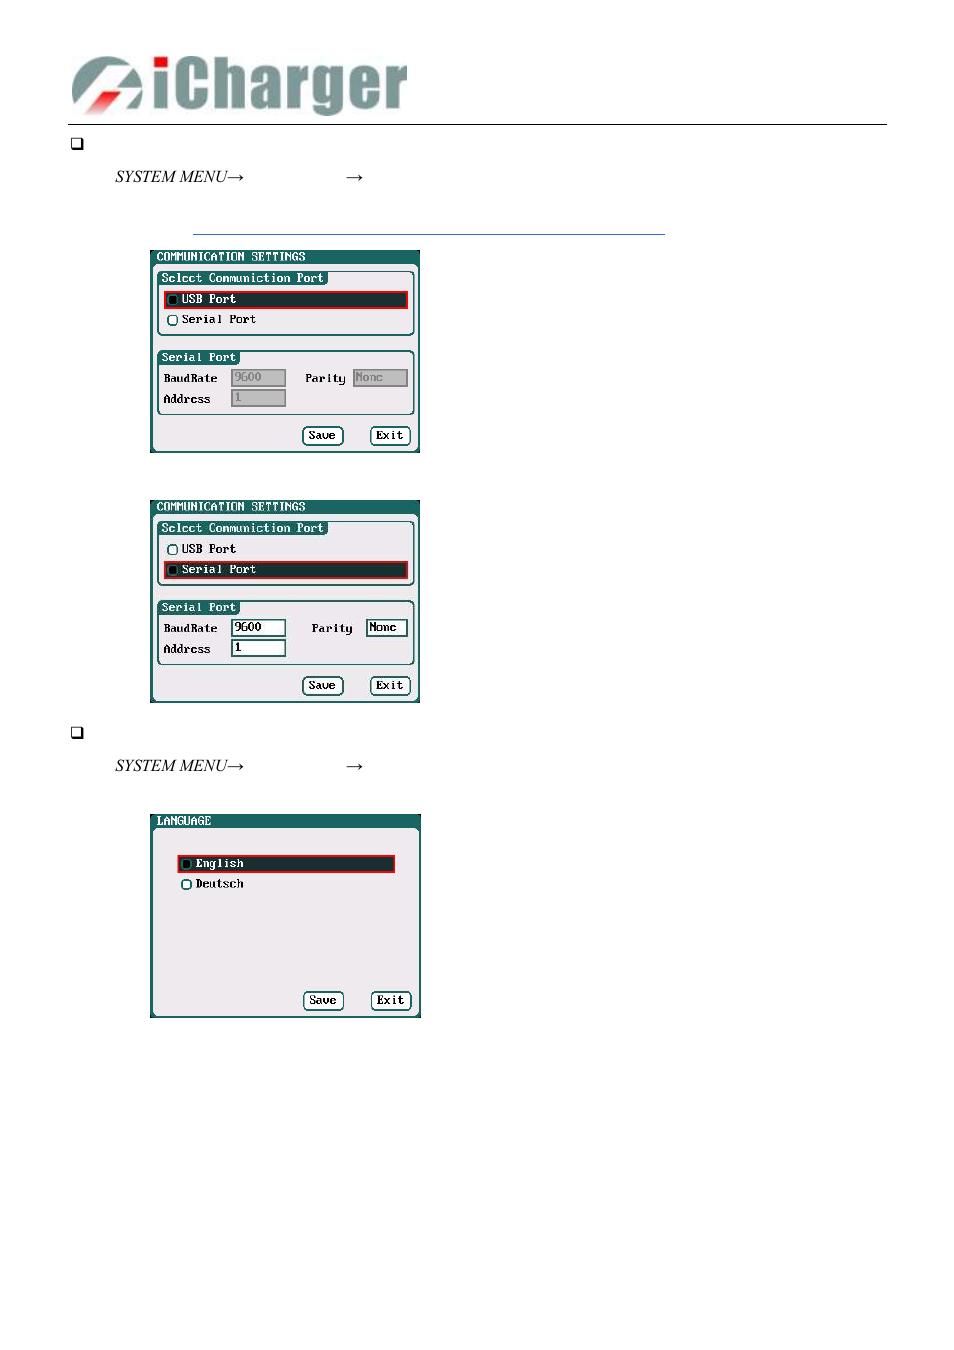 Communication settings - language setup | ProgressiveRC